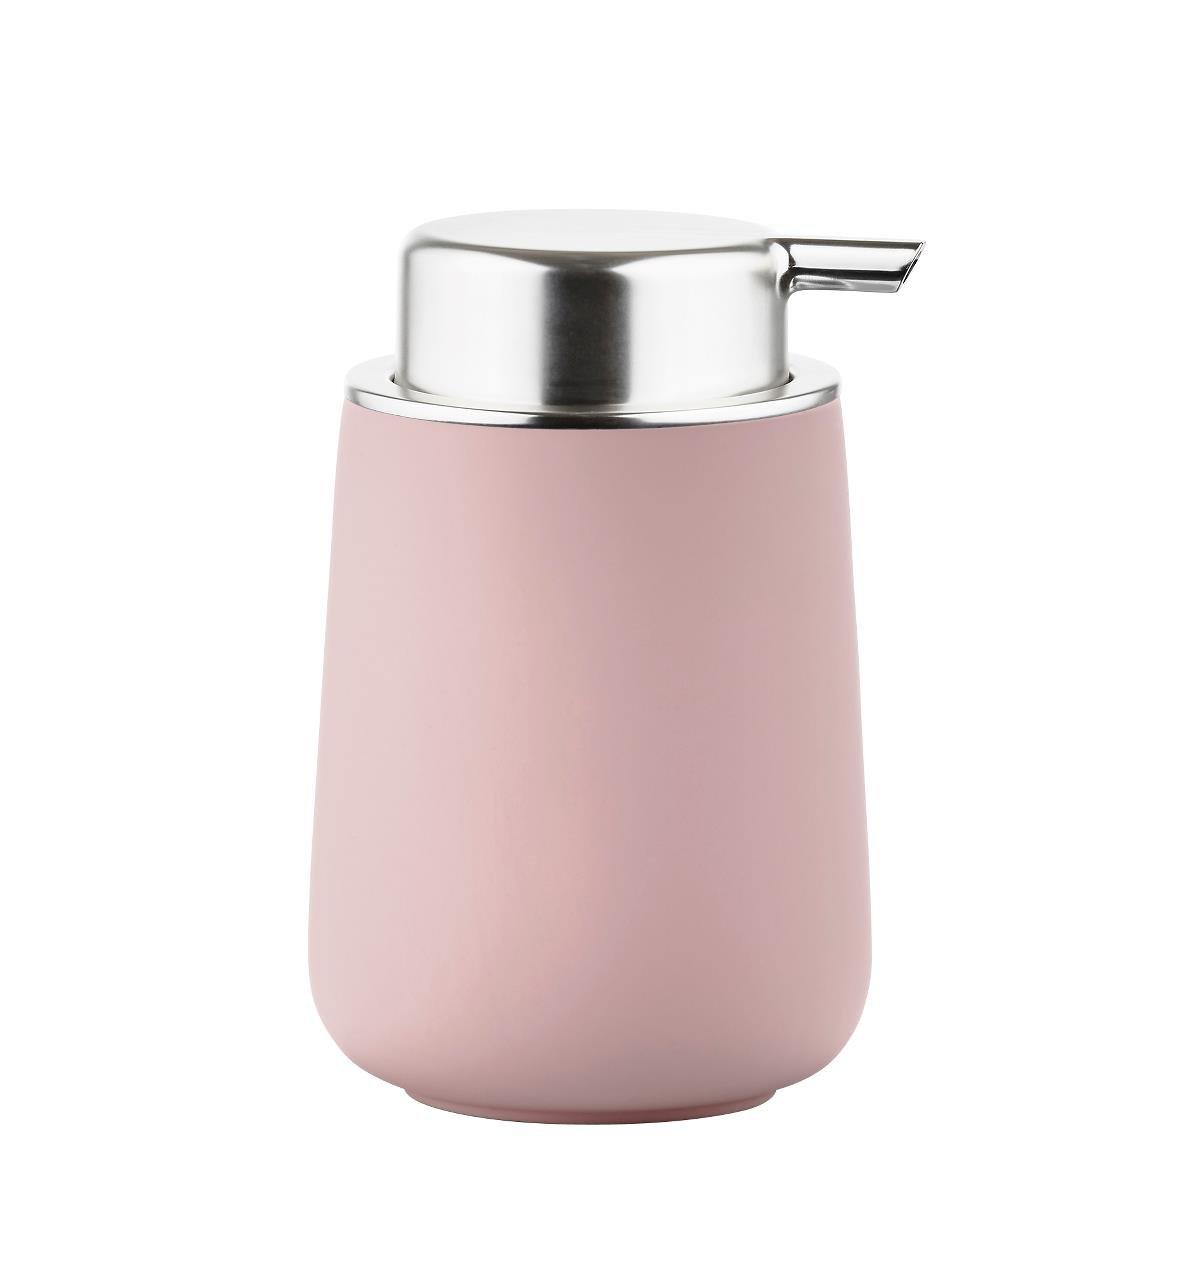 Zone - Nova Soap Dispenzer - Rose (330118)